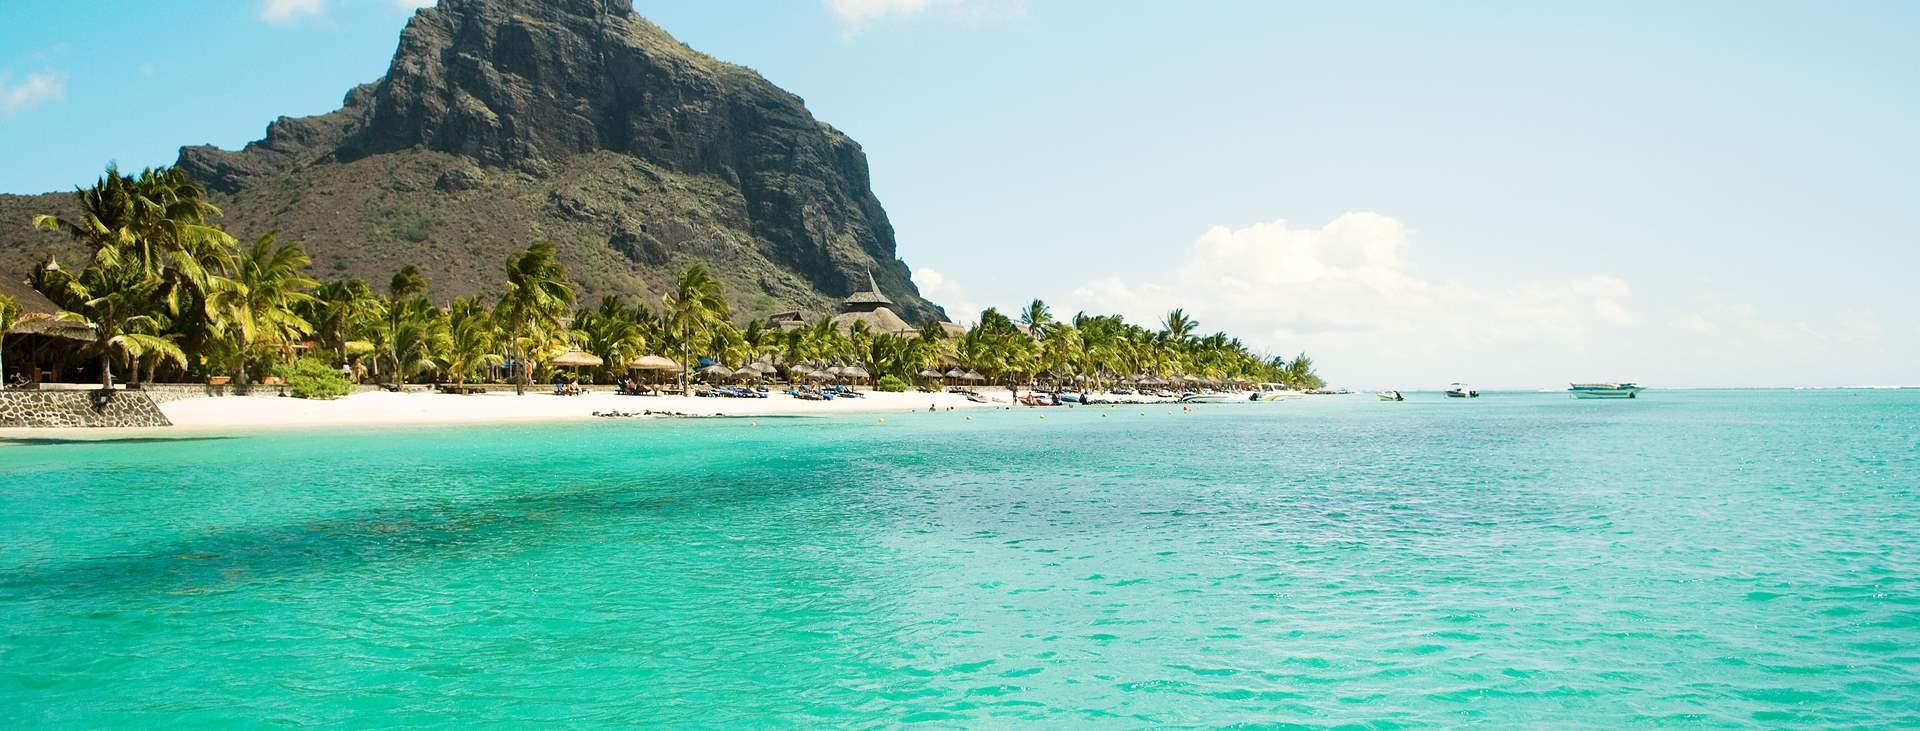 Boka en resa med All Inclusive till Mauritius